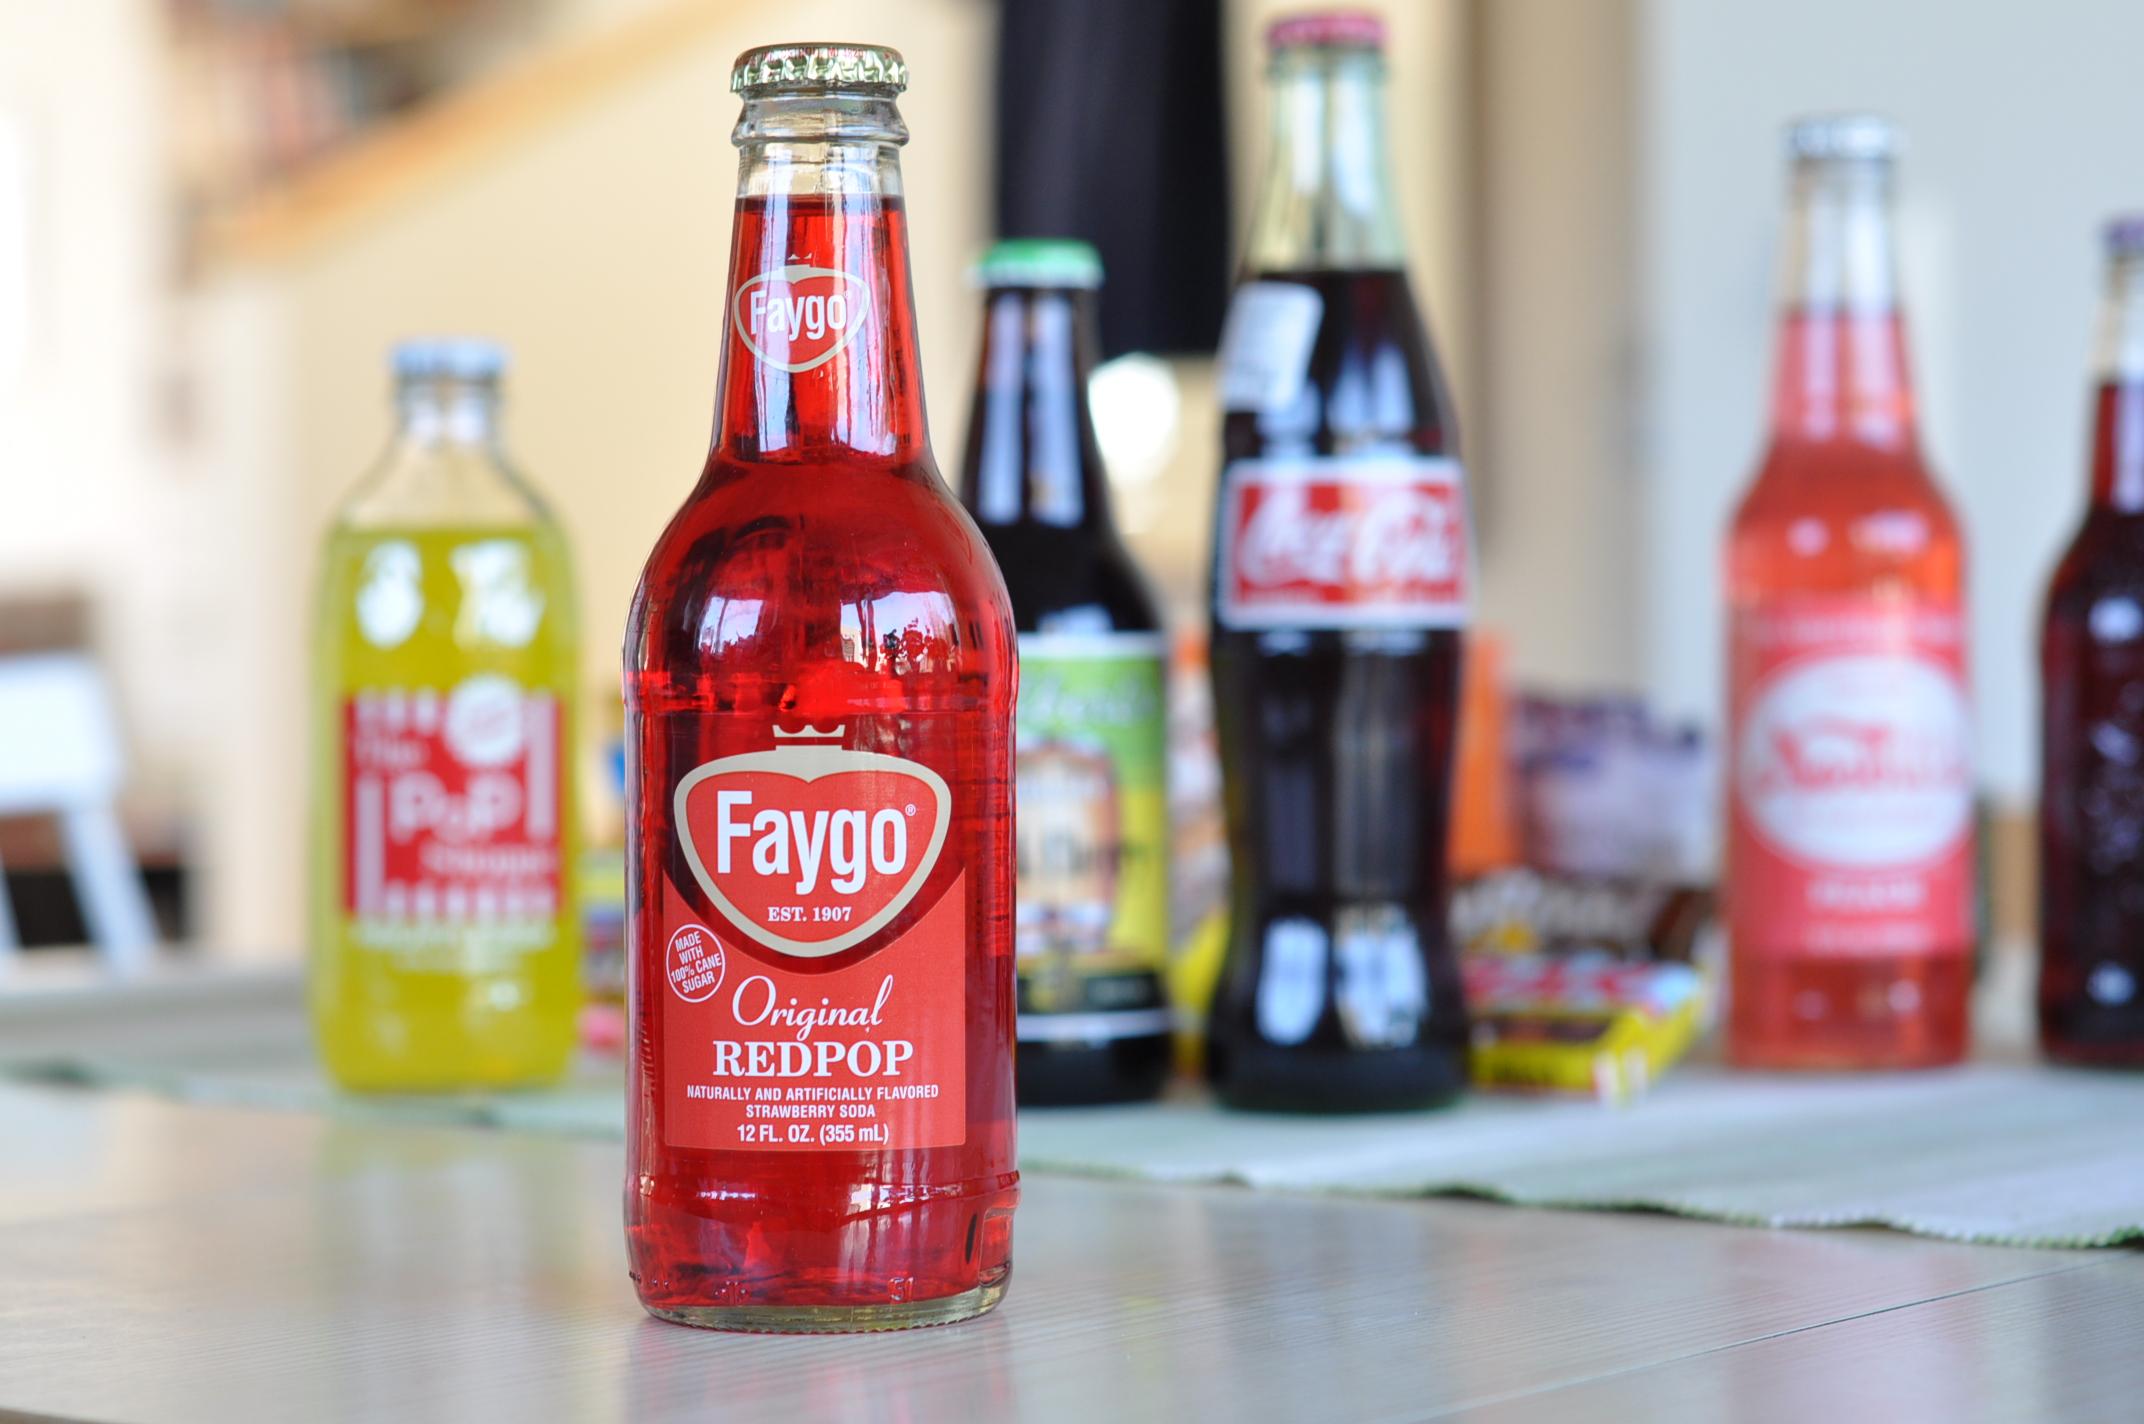 Faygo Redpop Strawberry